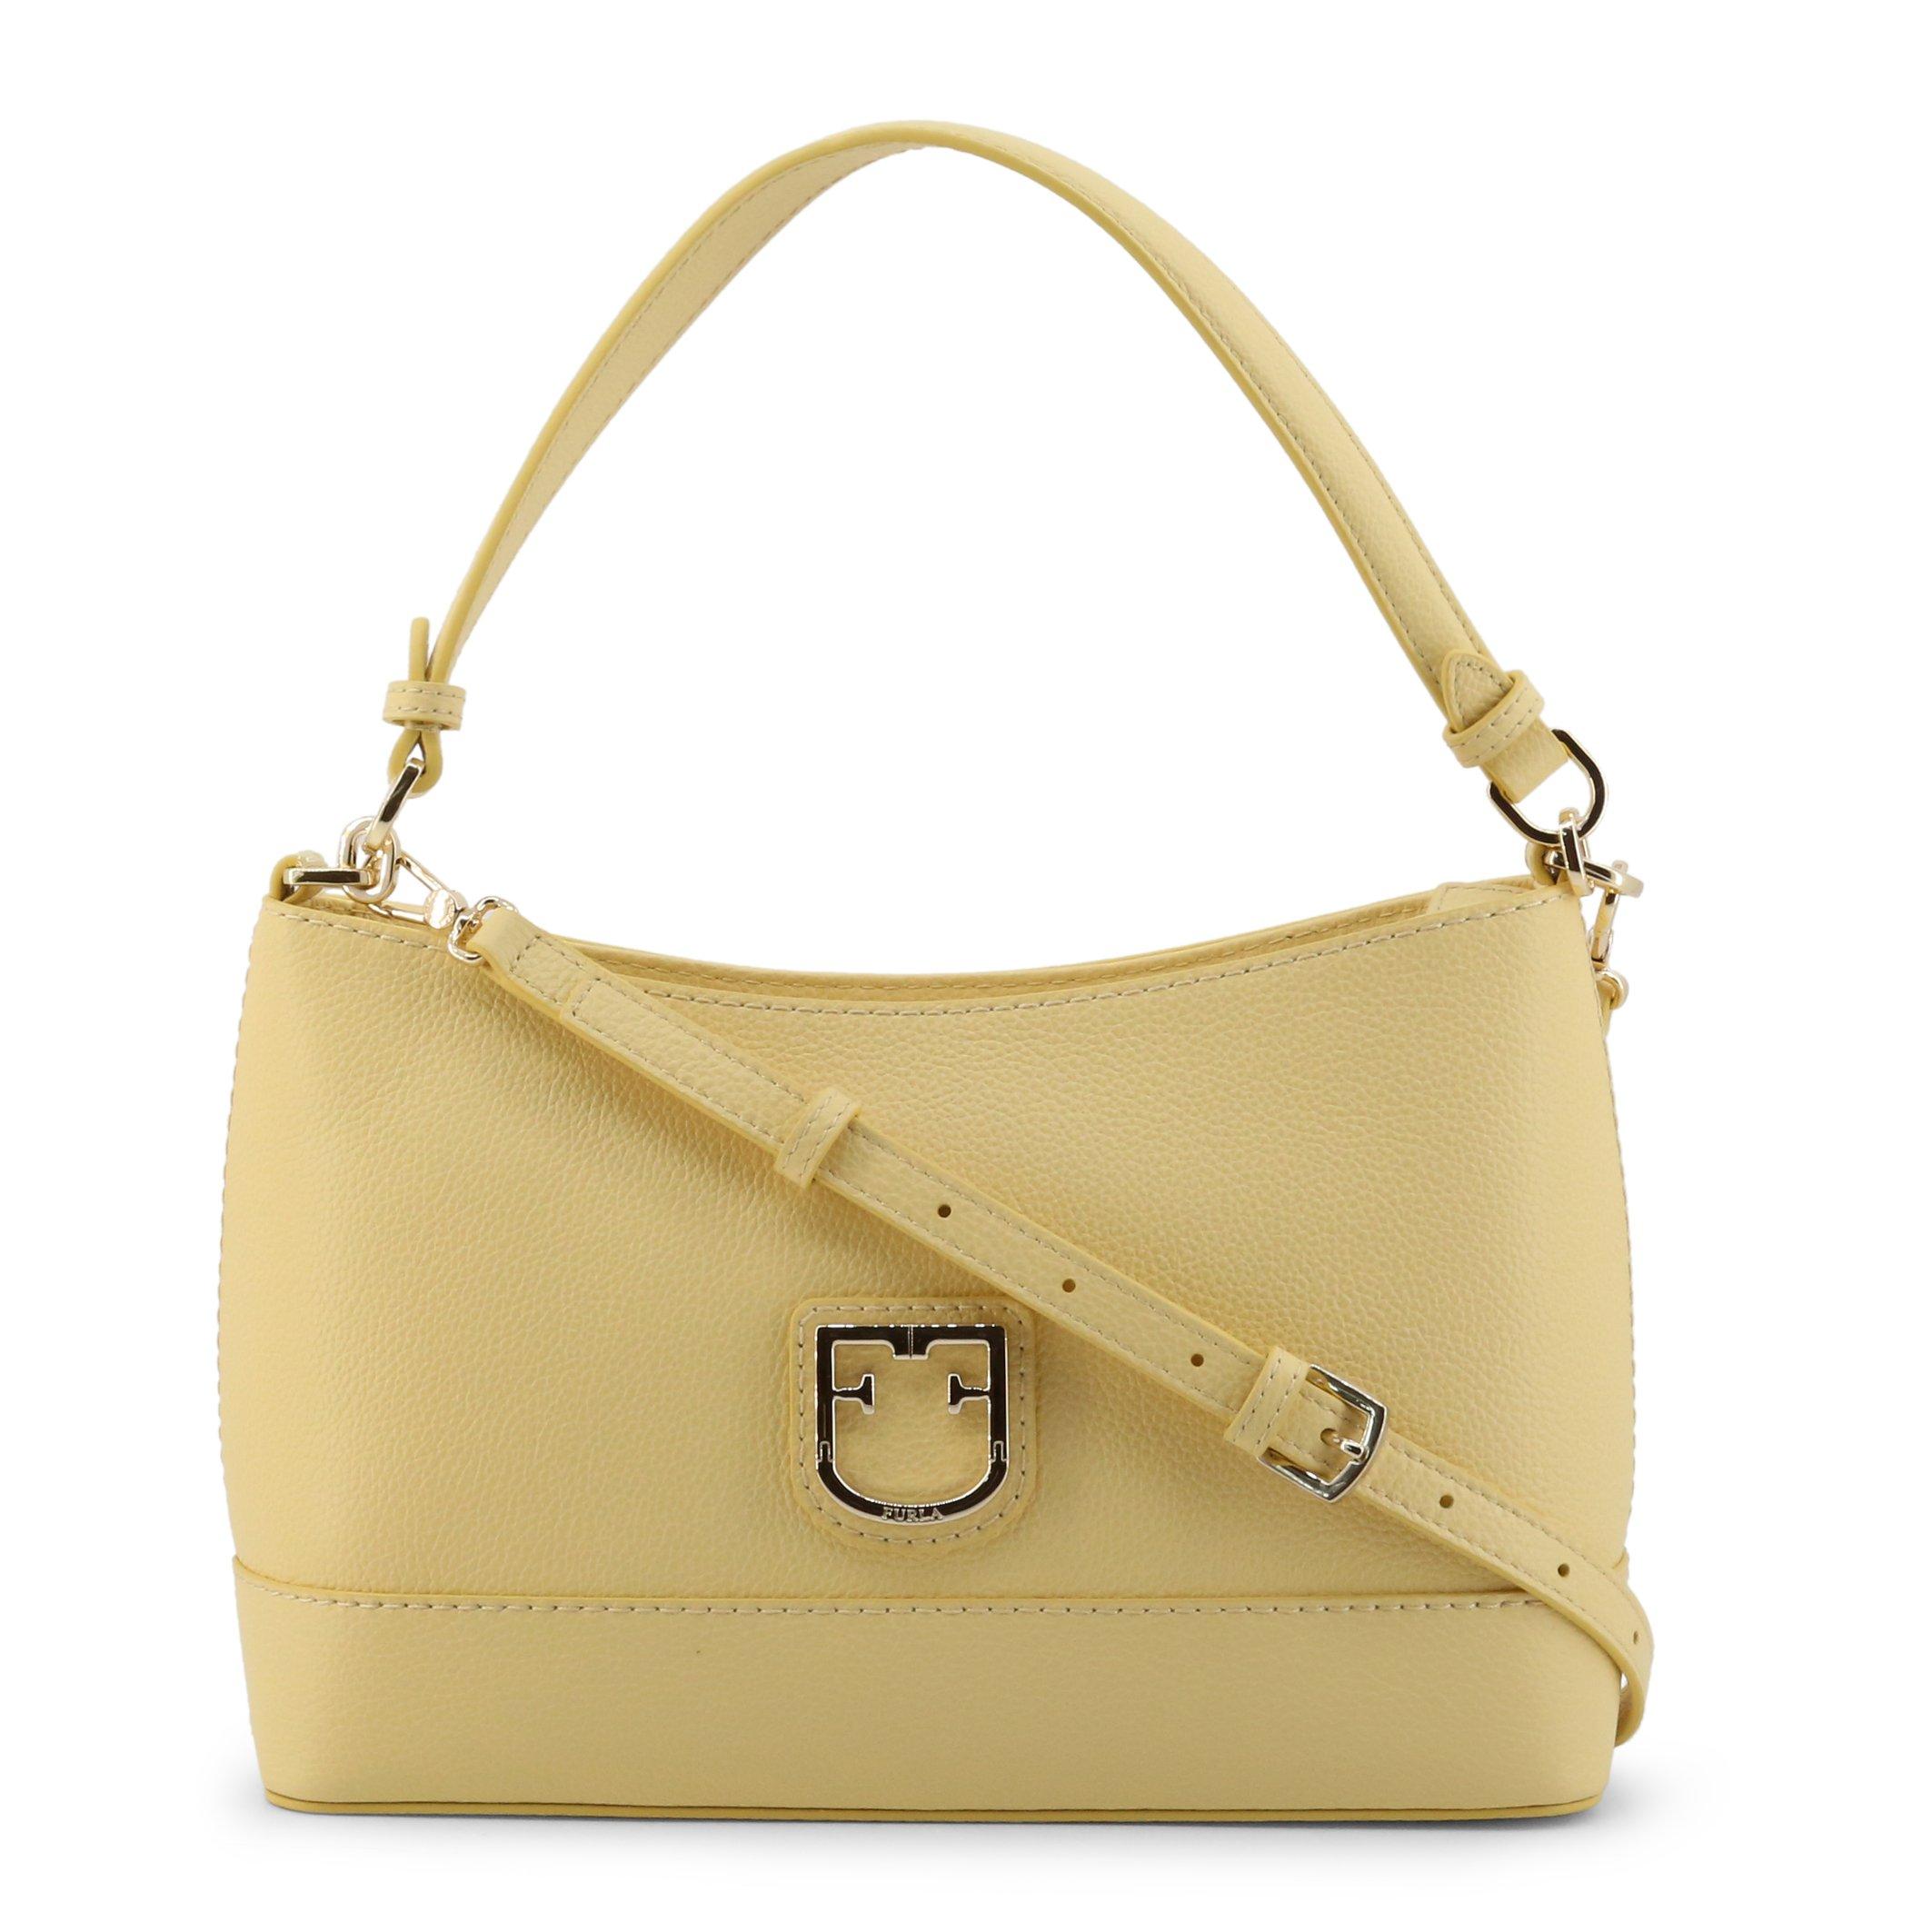 Furla Women's Handbag Various Colours HARPER_WB00063 - yellow NOSIZE